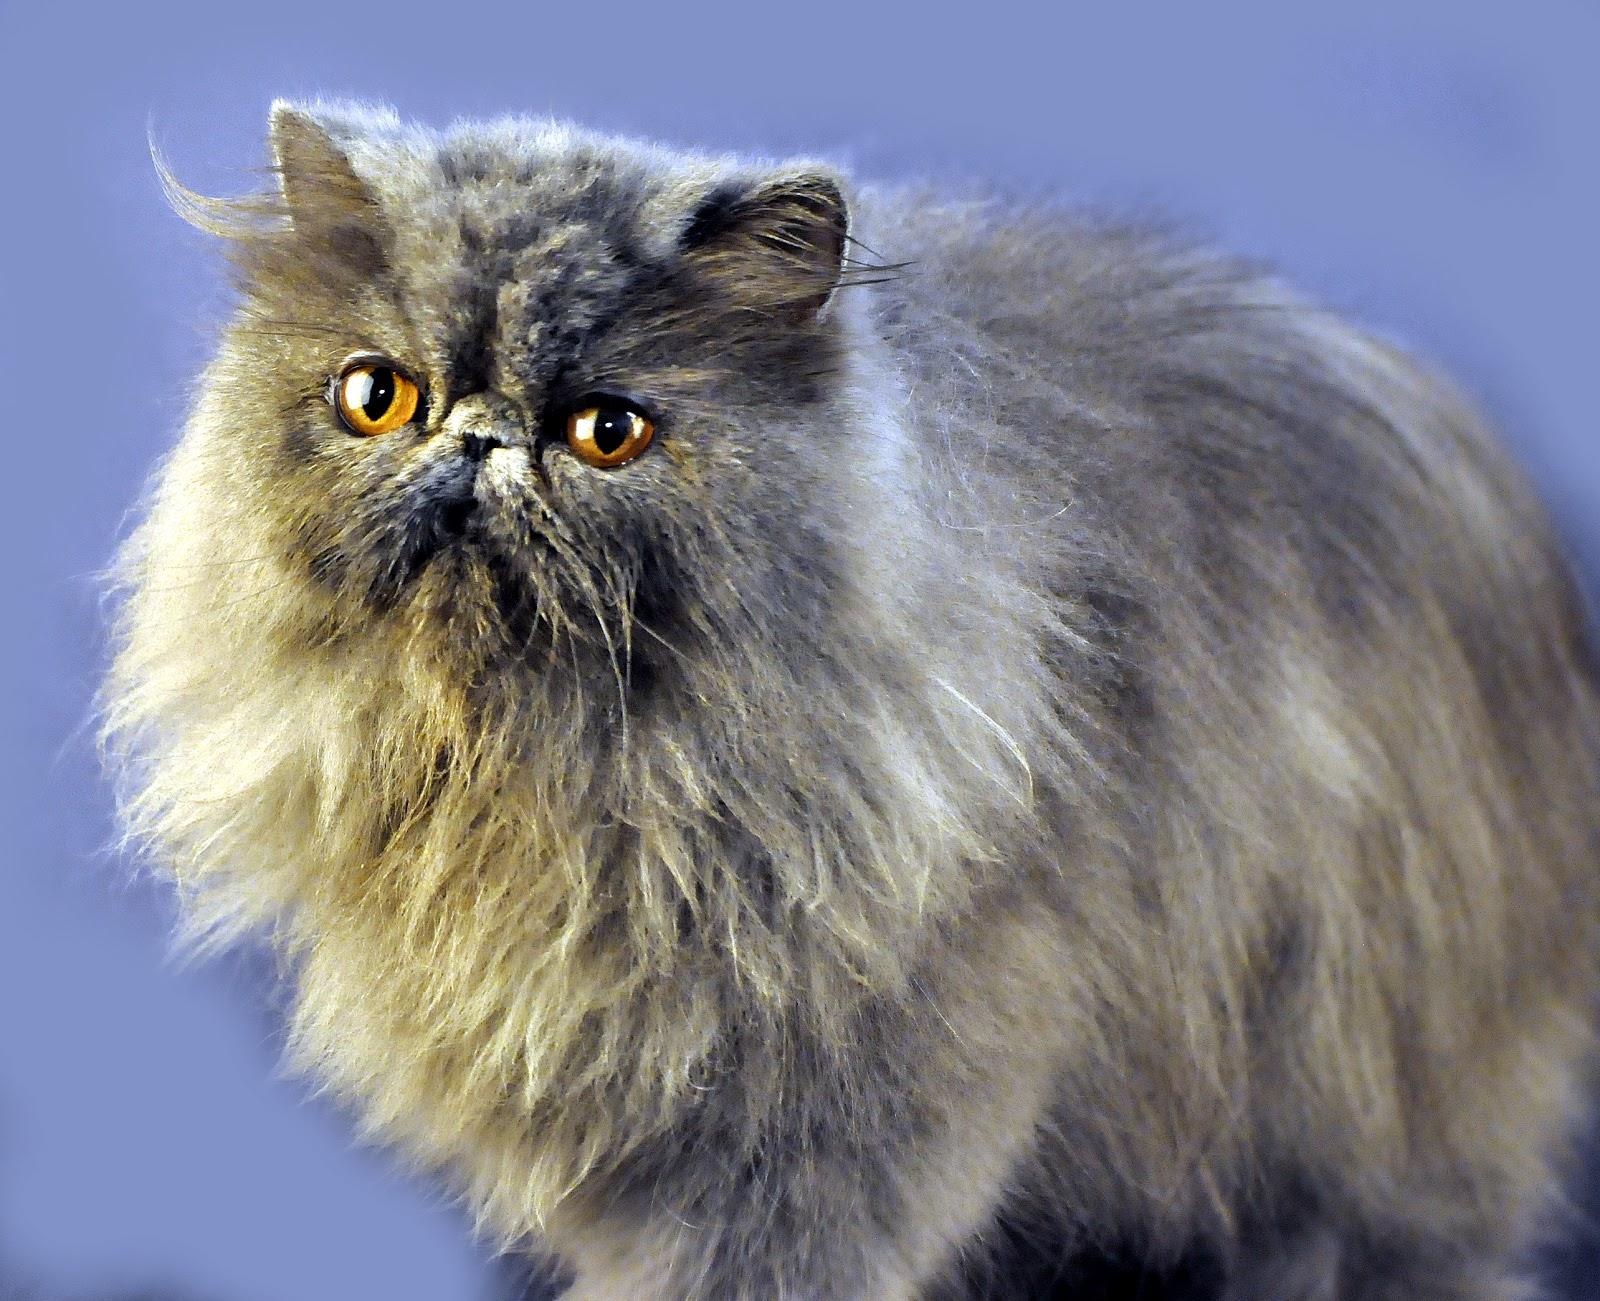 Aneka Kucing Ras Yang Paling Banyak Disukai Info Kucing Persia